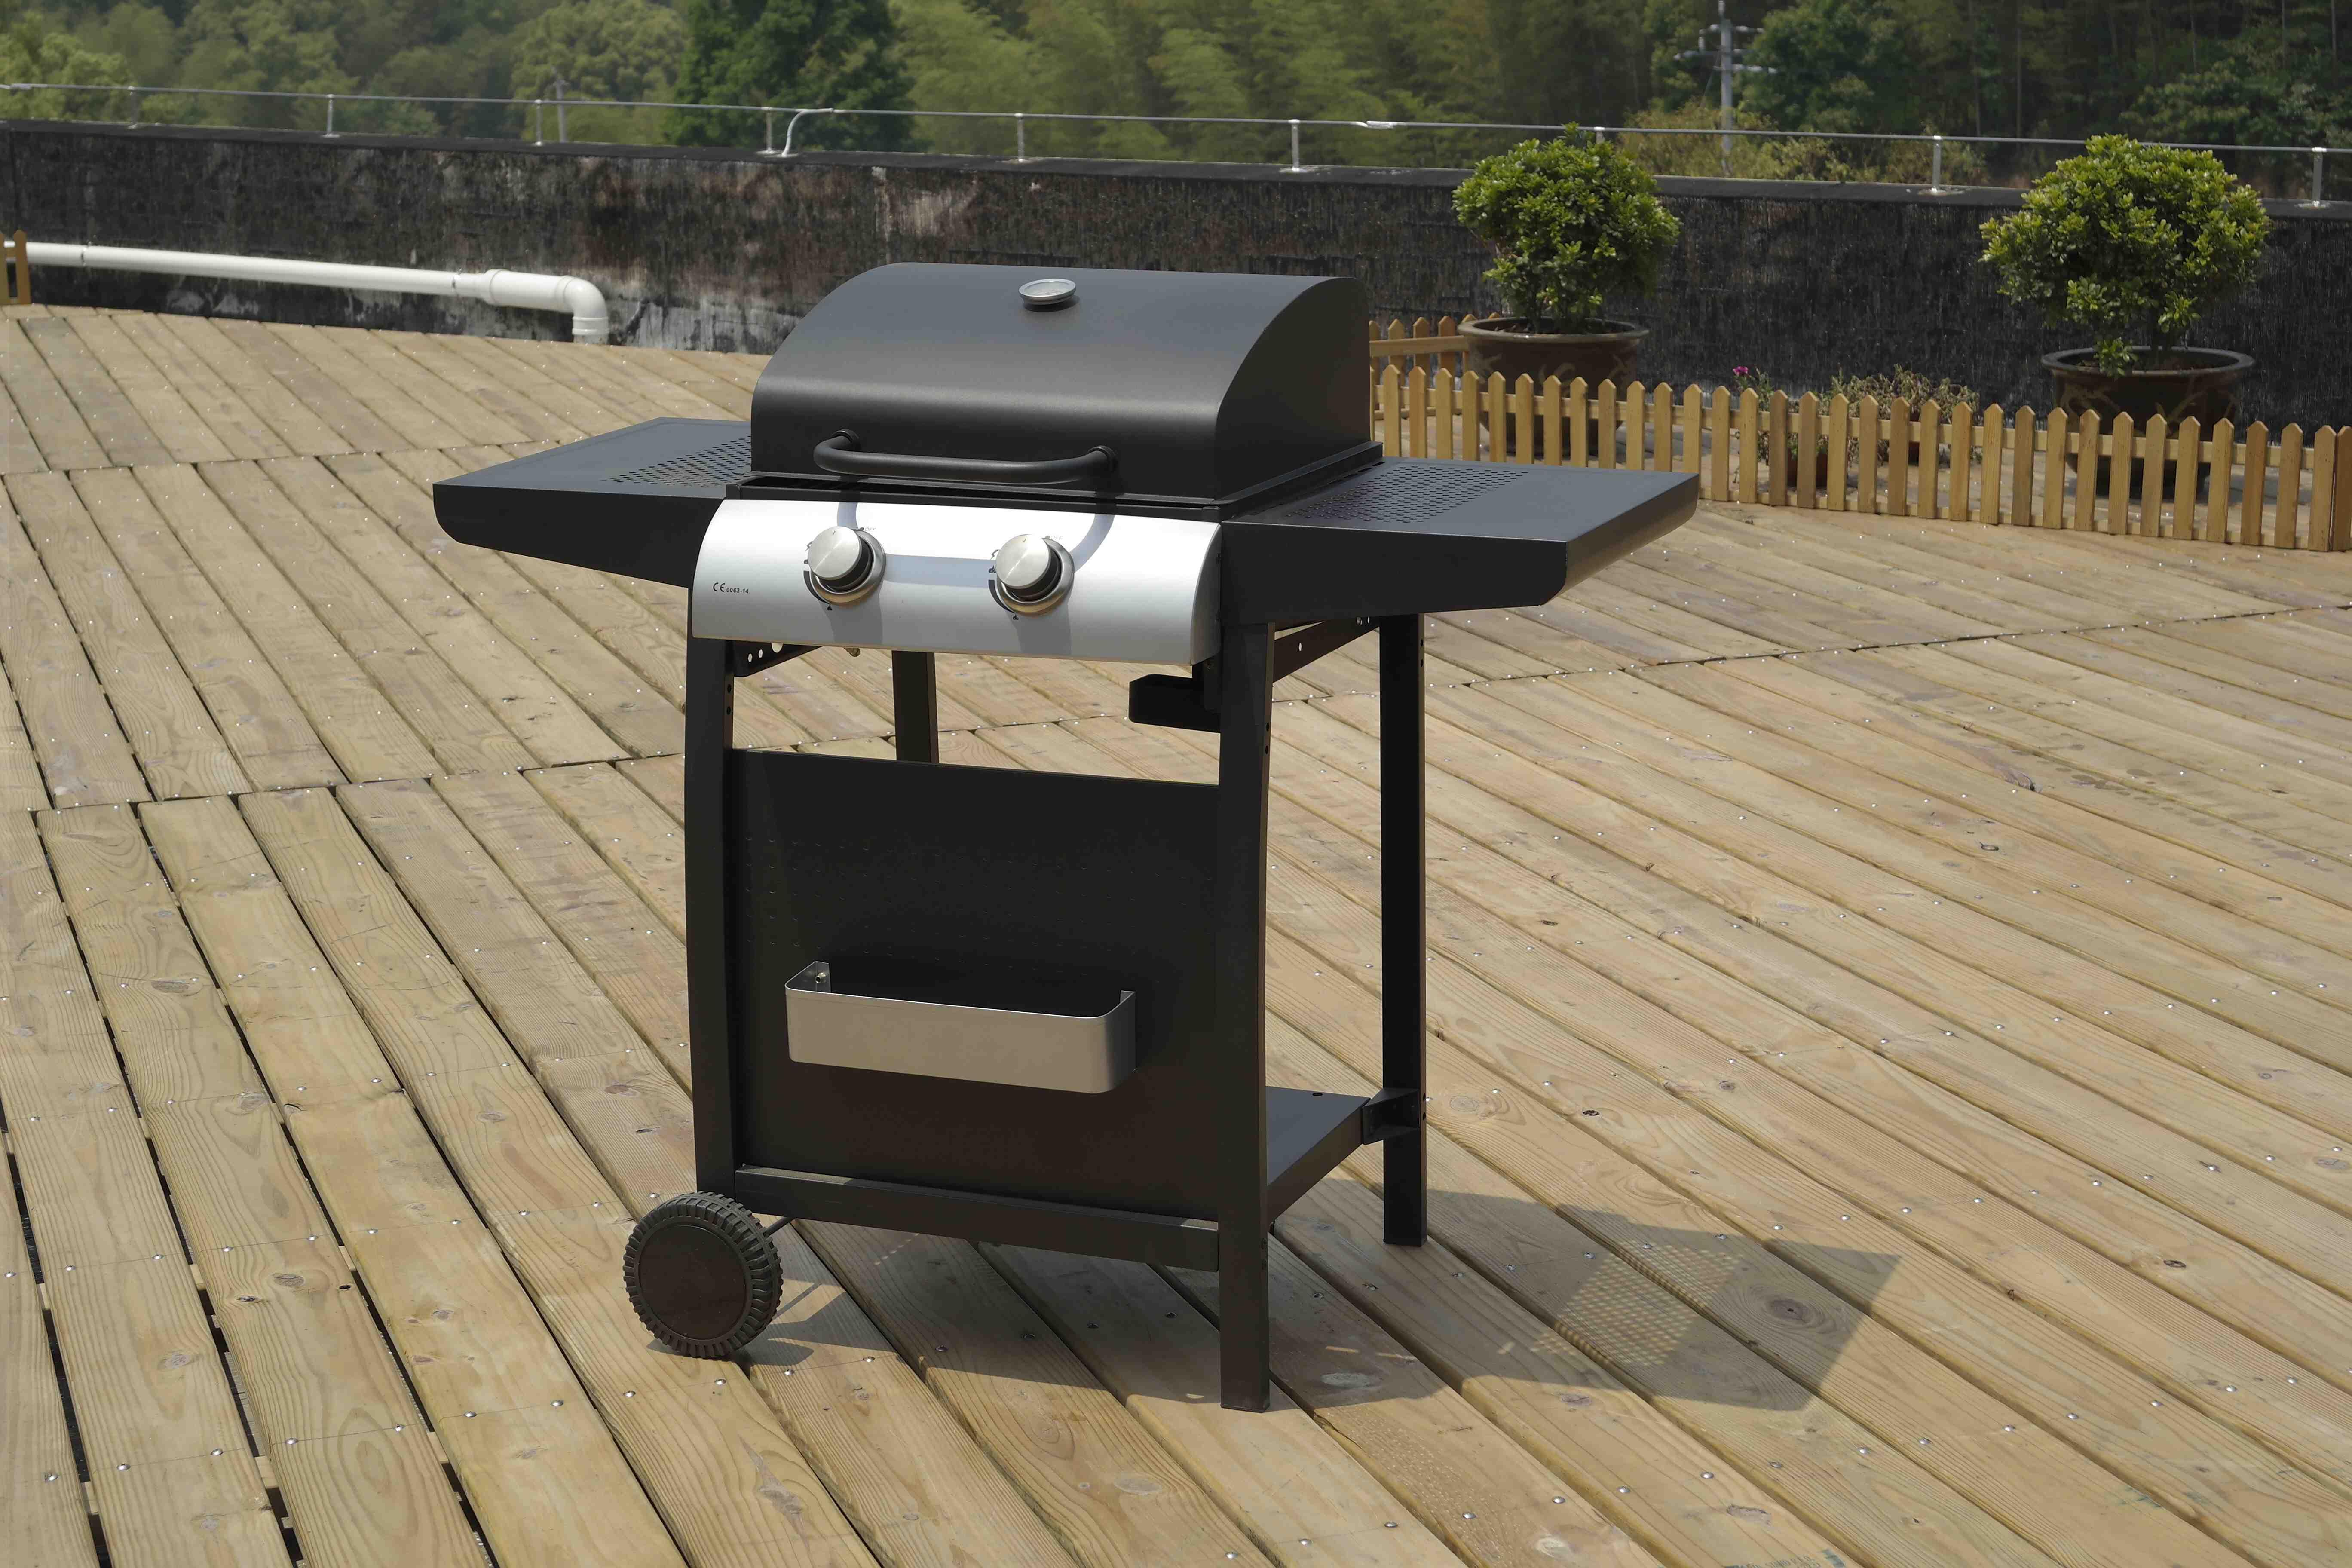 BillyOh Garden Grill 2 Burner Hooded Gas BBQ